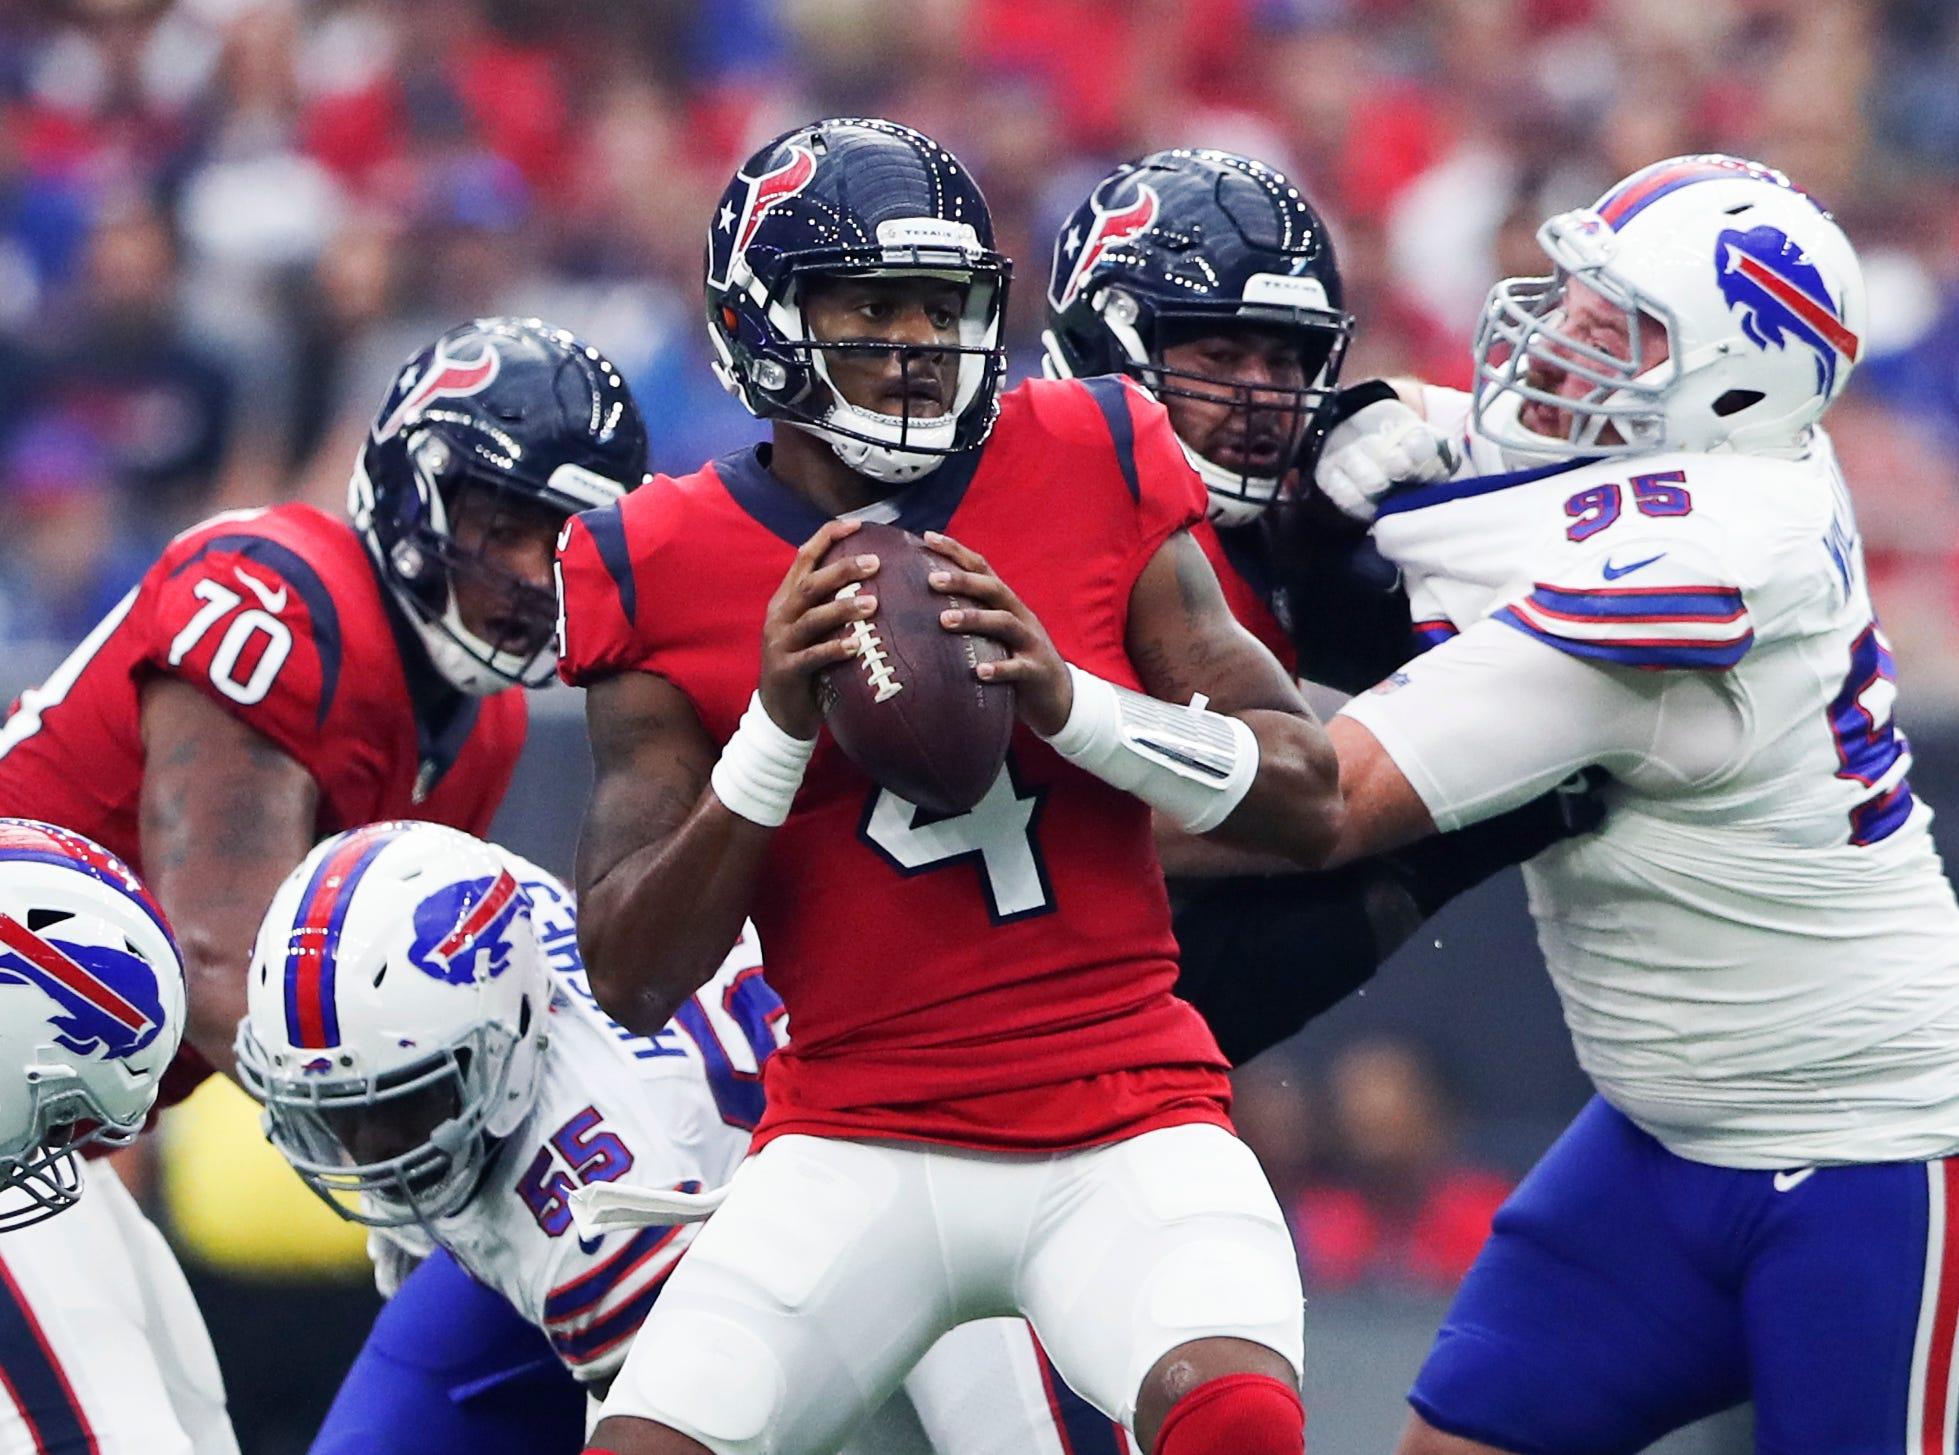 Oct 14, 2018; Houston, TX, USA; Houston Texans quarterback Deshaun Watson (4) throws during the first quarter against the Buffalo Bills at NRG Stadium. Mandatory Credit: Kevin Jairaj-USA TODAY Sports